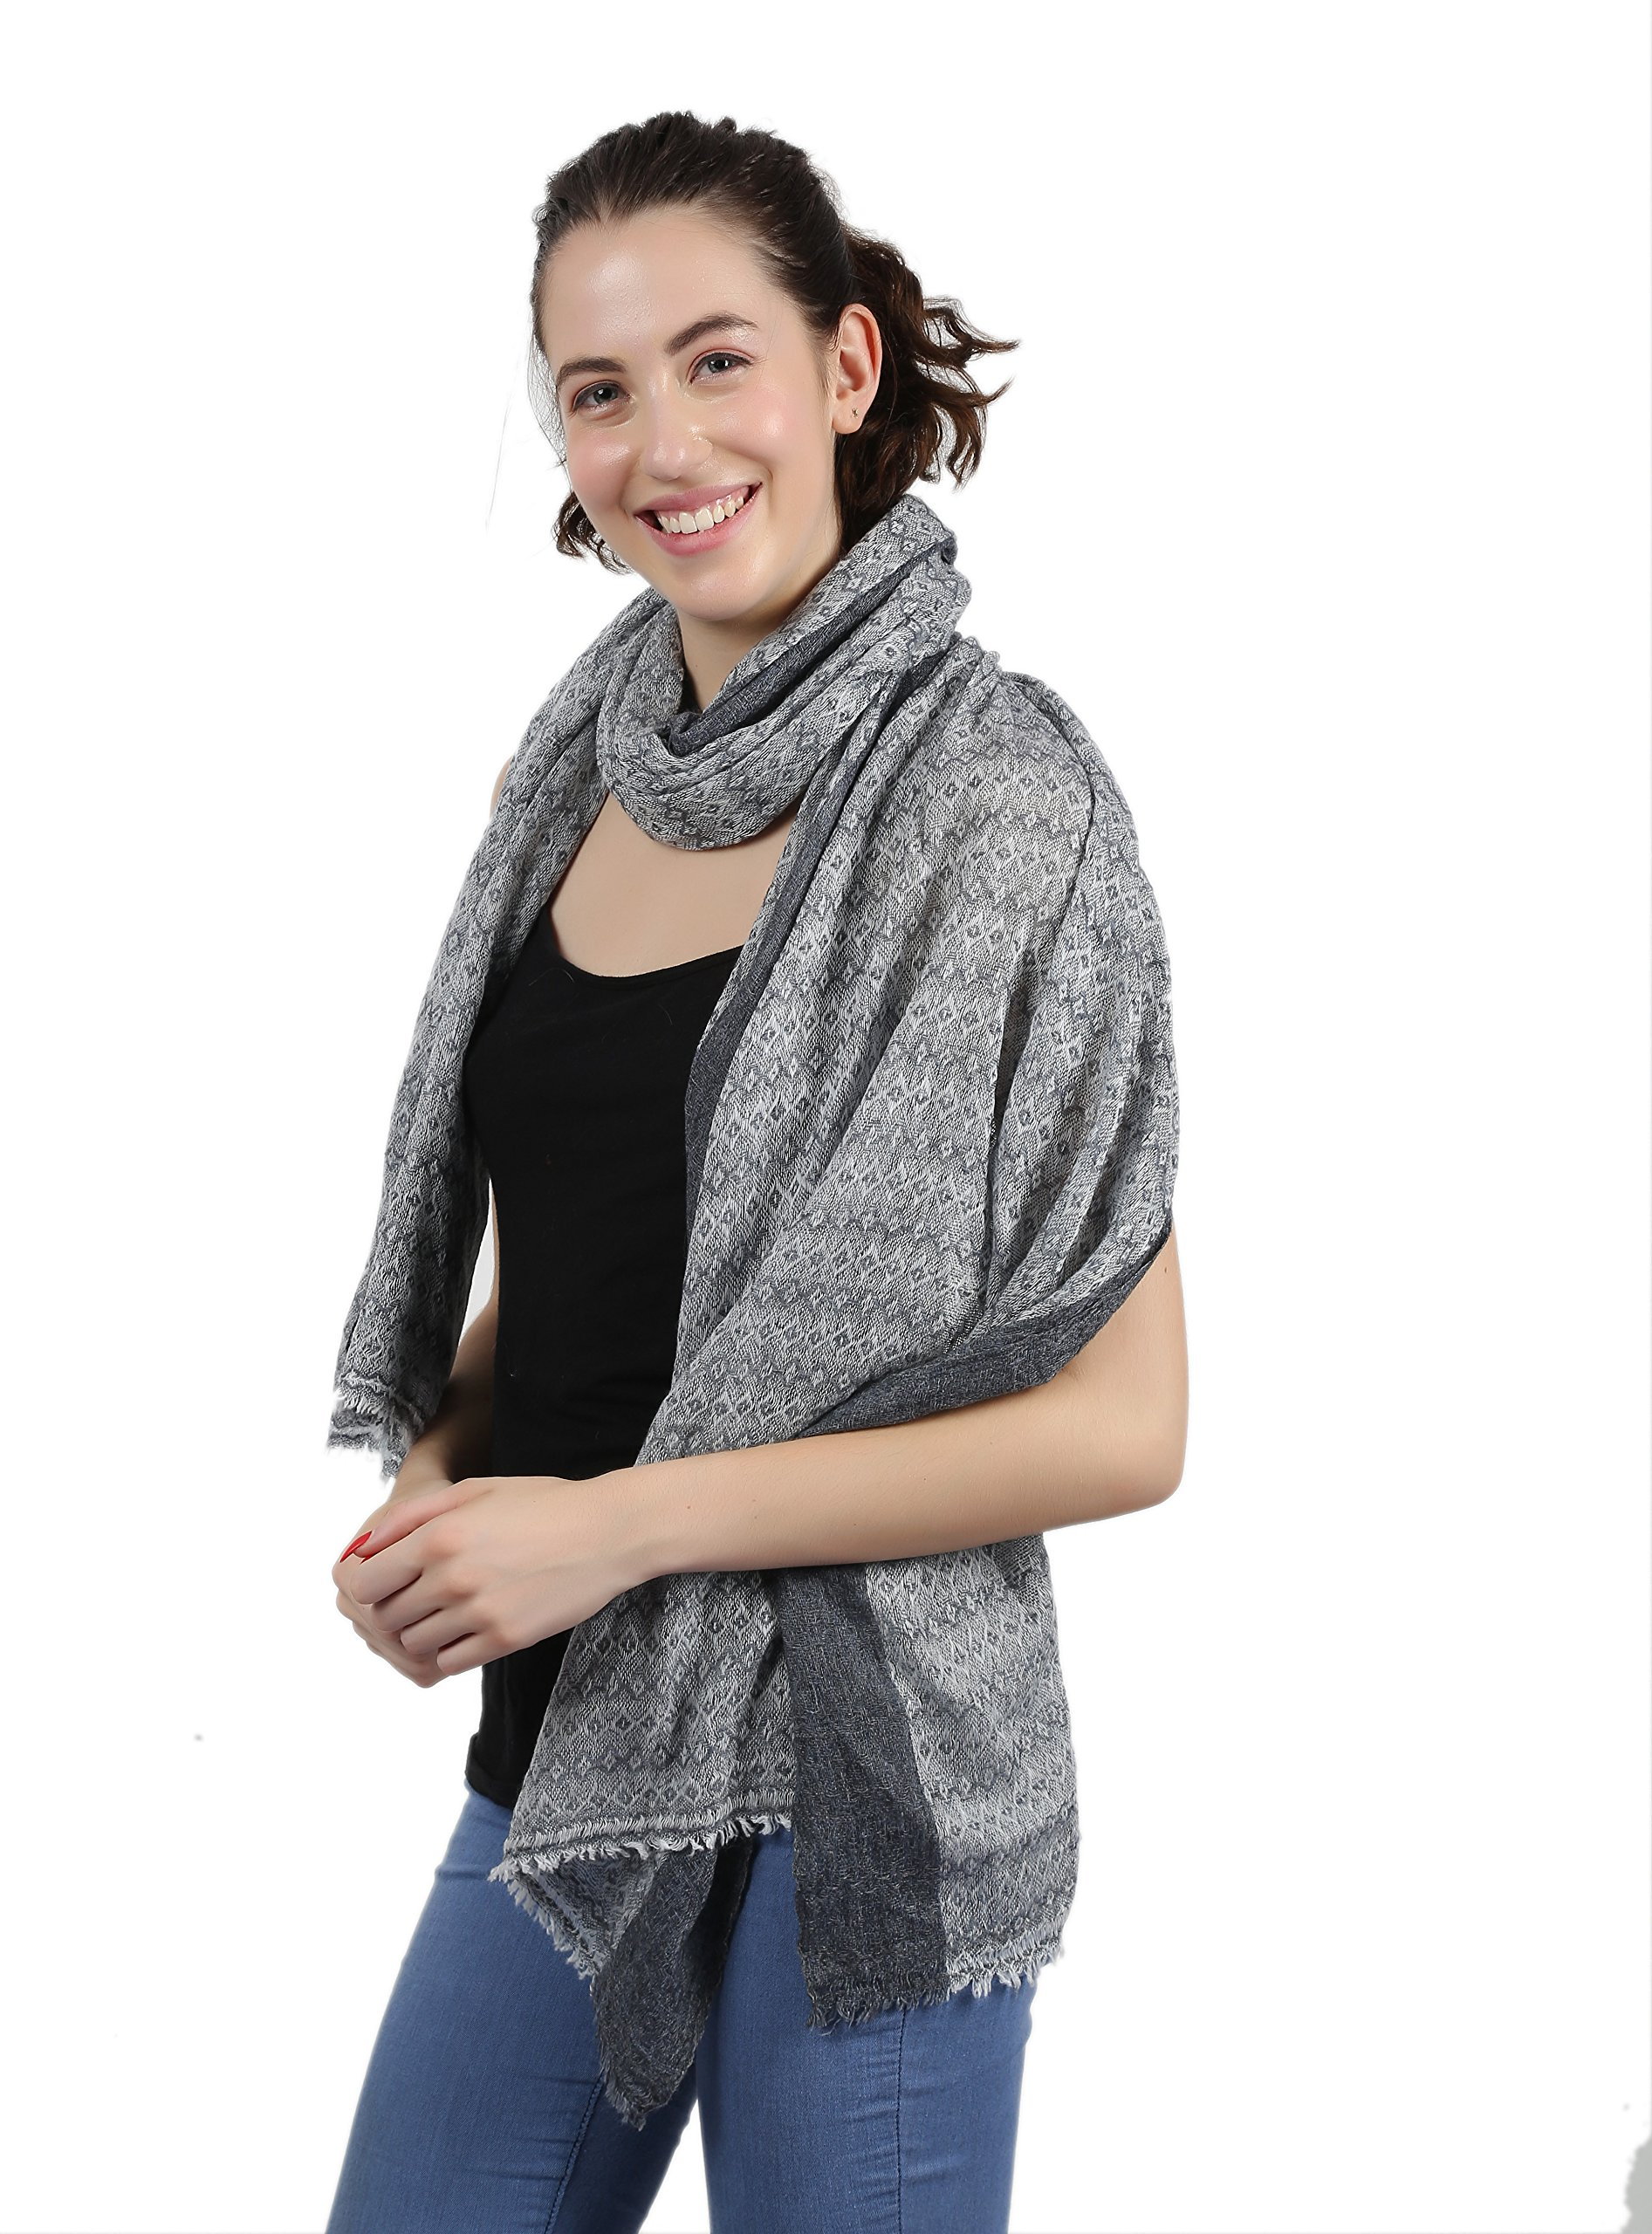 Merino Wool, Super Soft, Warm, & Light, Jacquard Weave, Oversize, Thick Scarf. X2084